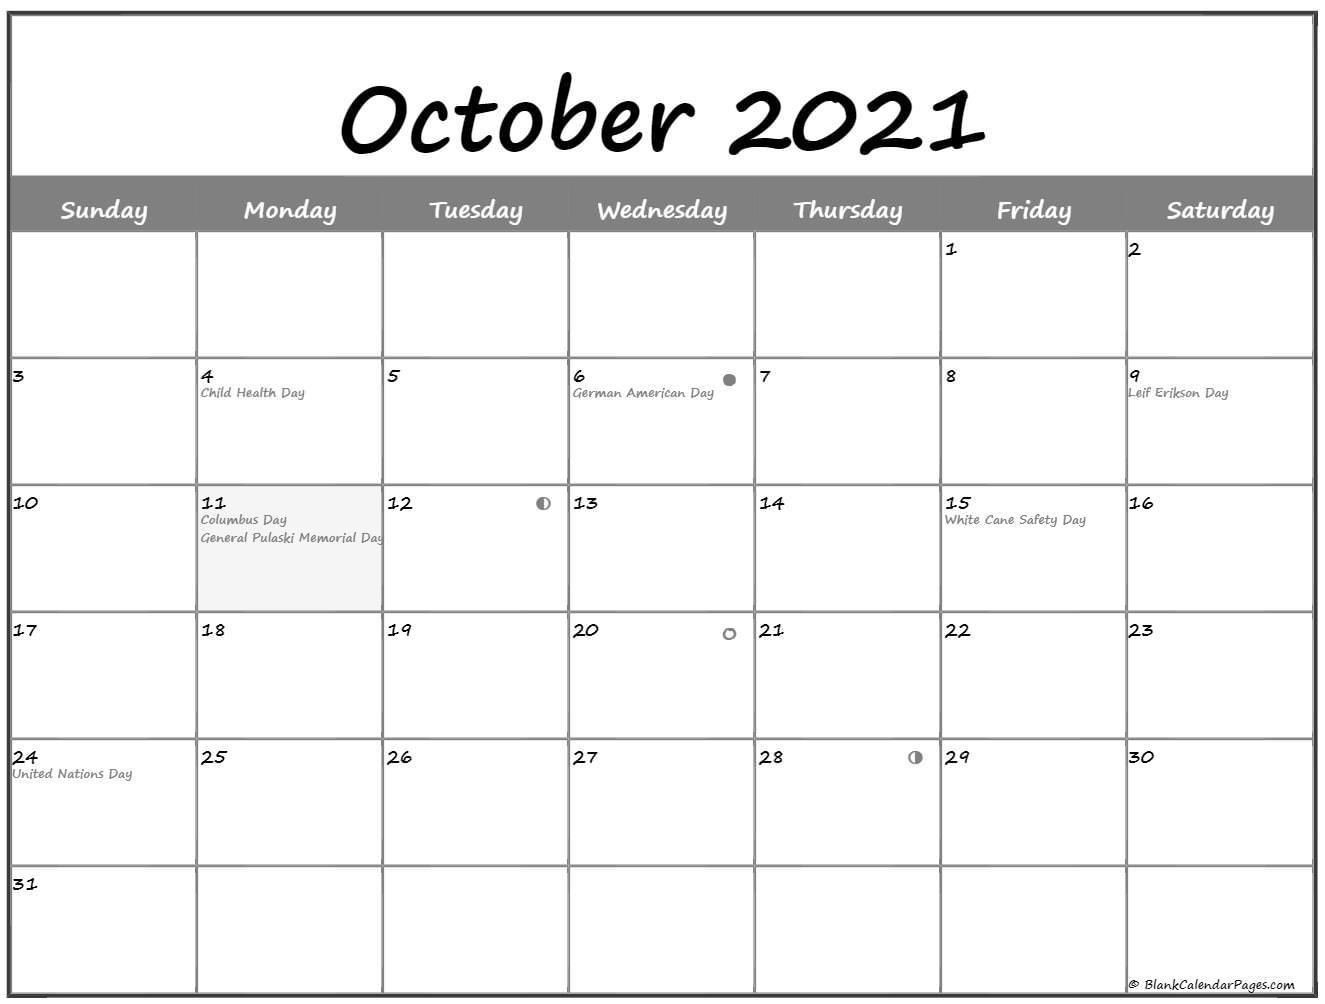 October 2021 Lunar Calendar | Moon Phase Calendar July 2021 Lunar Calendar